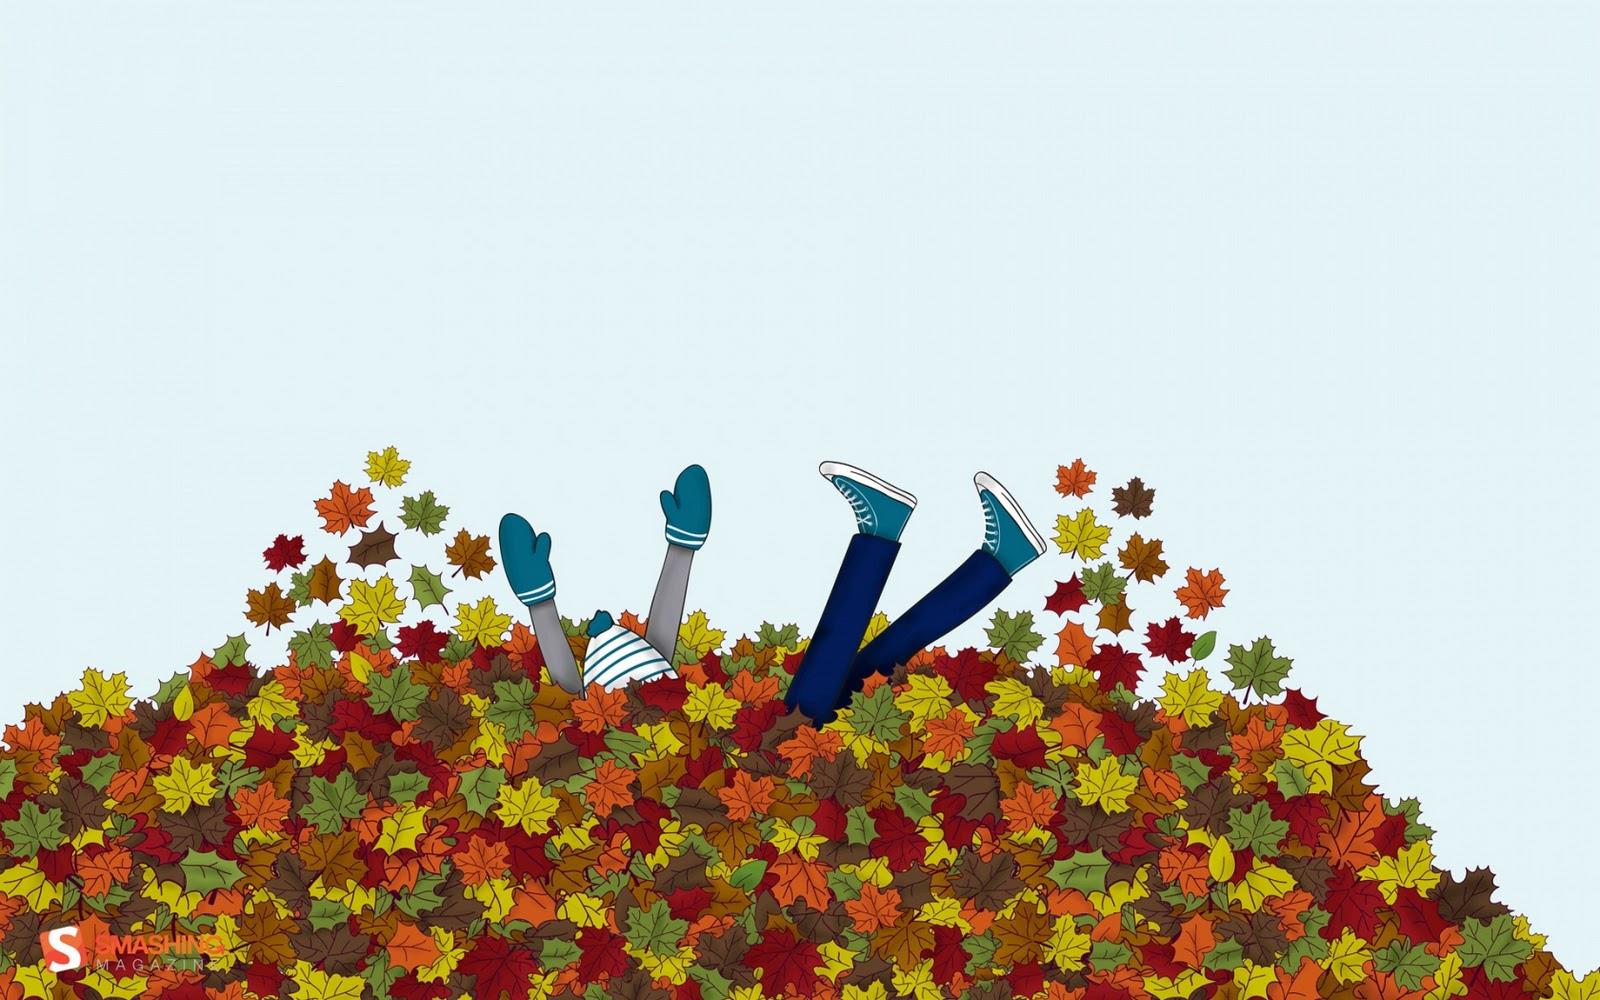 The best top autumn desktop wallpapers 20 En Güzel Sonbahar HD Duvar Kağıtları